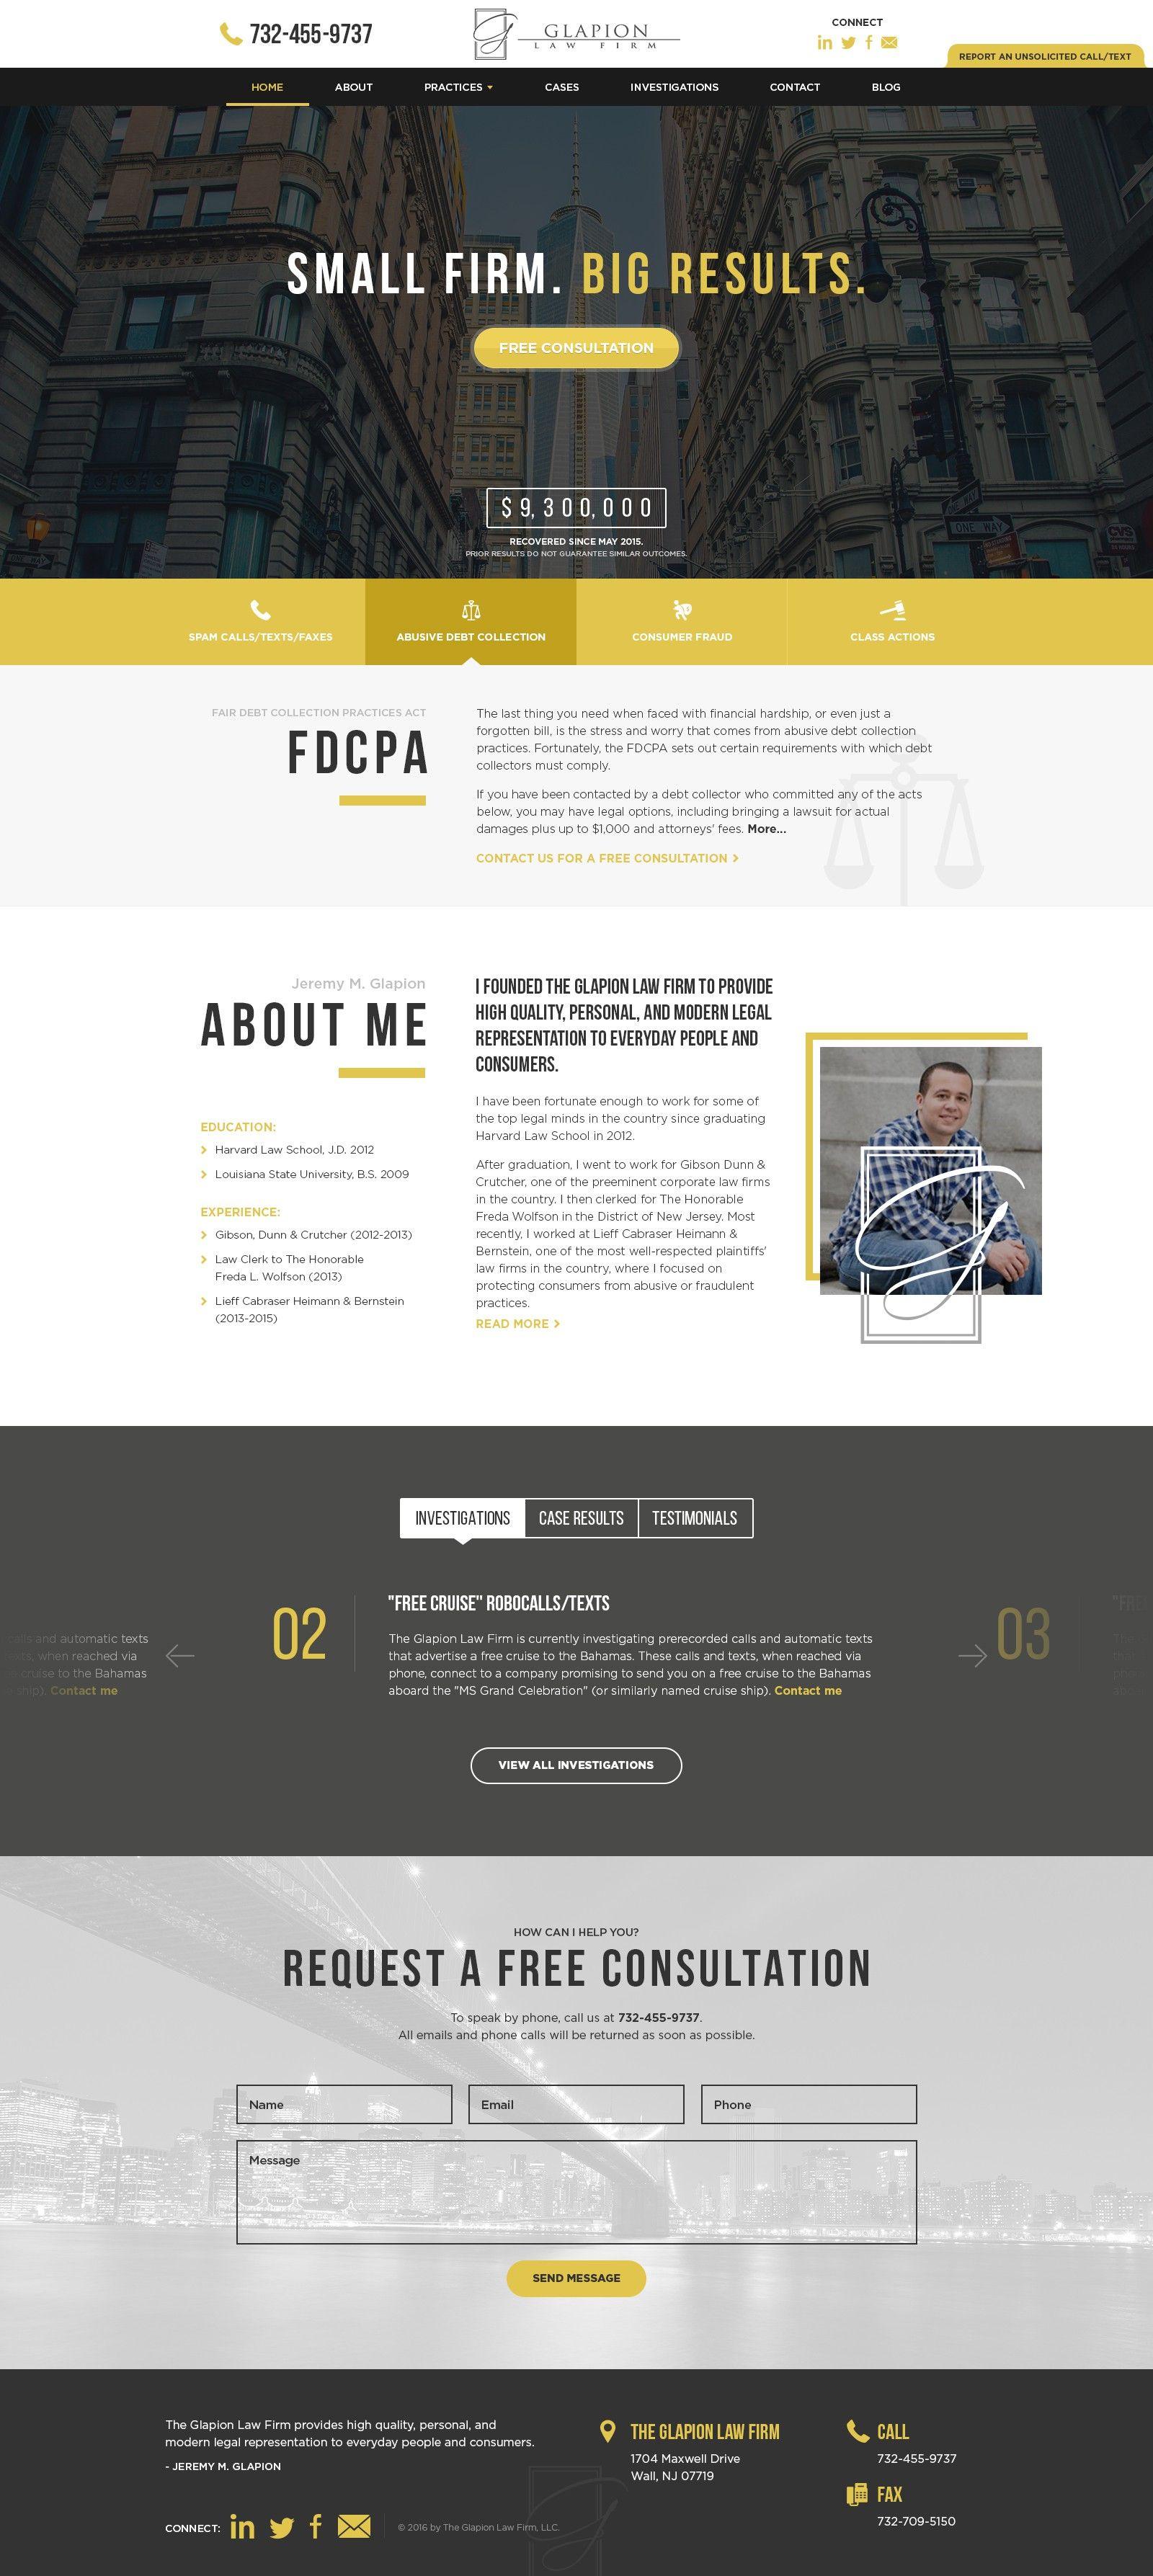 Pin Van Coolpixel Wordpress Webdesig Op Web Design